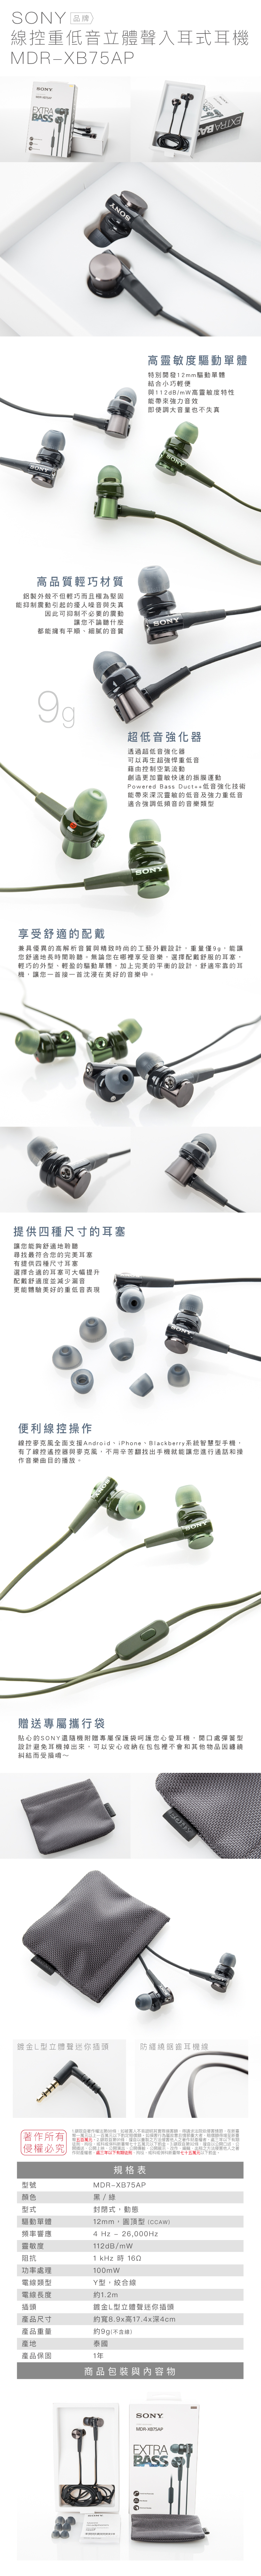 headset_36